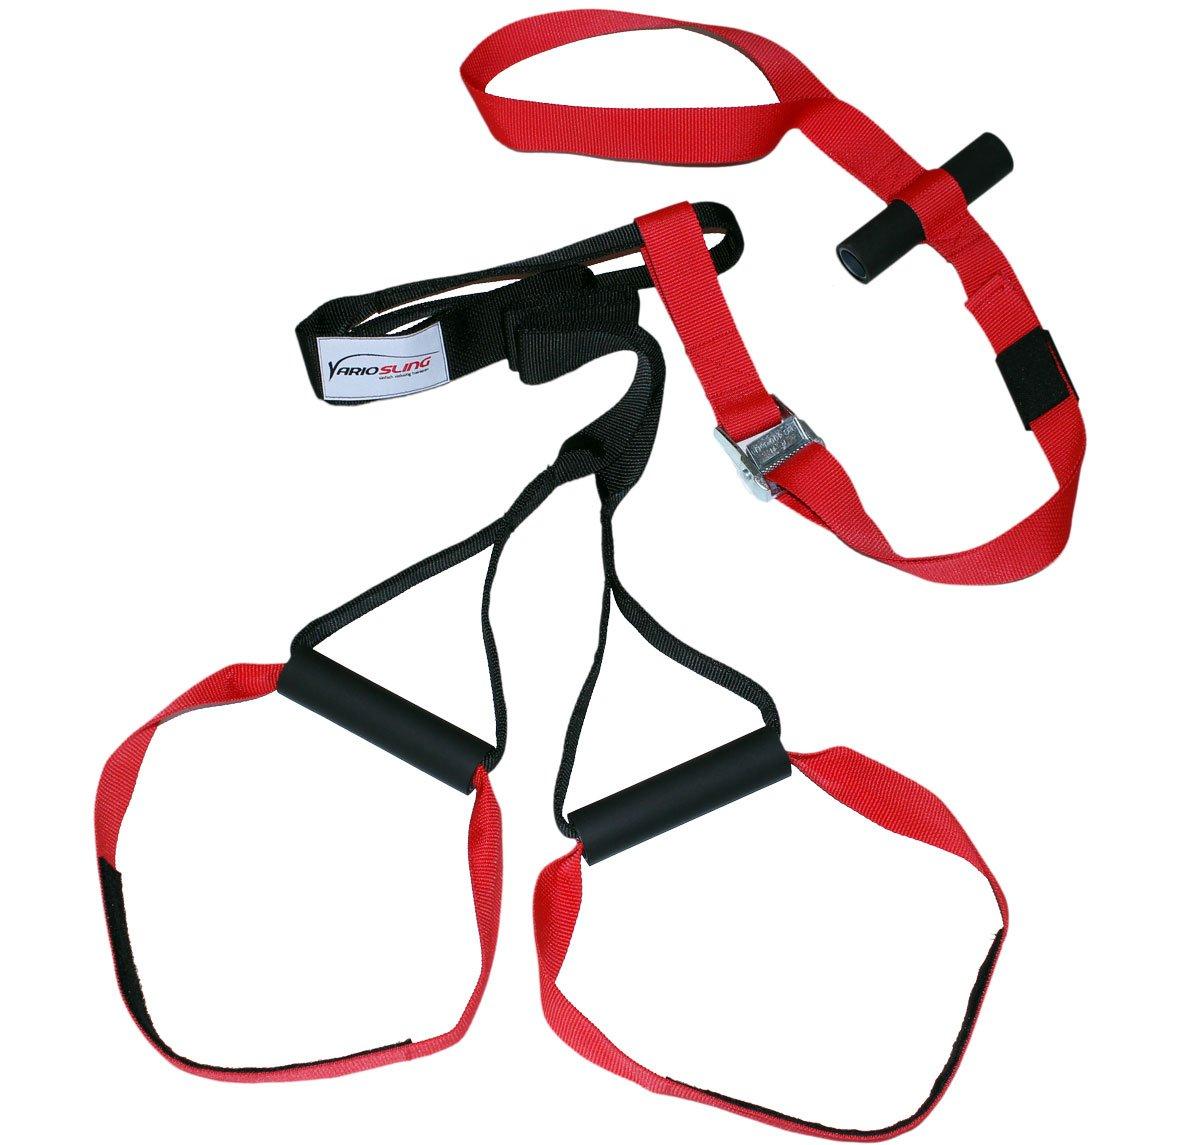 Variosling Sling Trainer Basic Paket, rot schwarz, VS-03